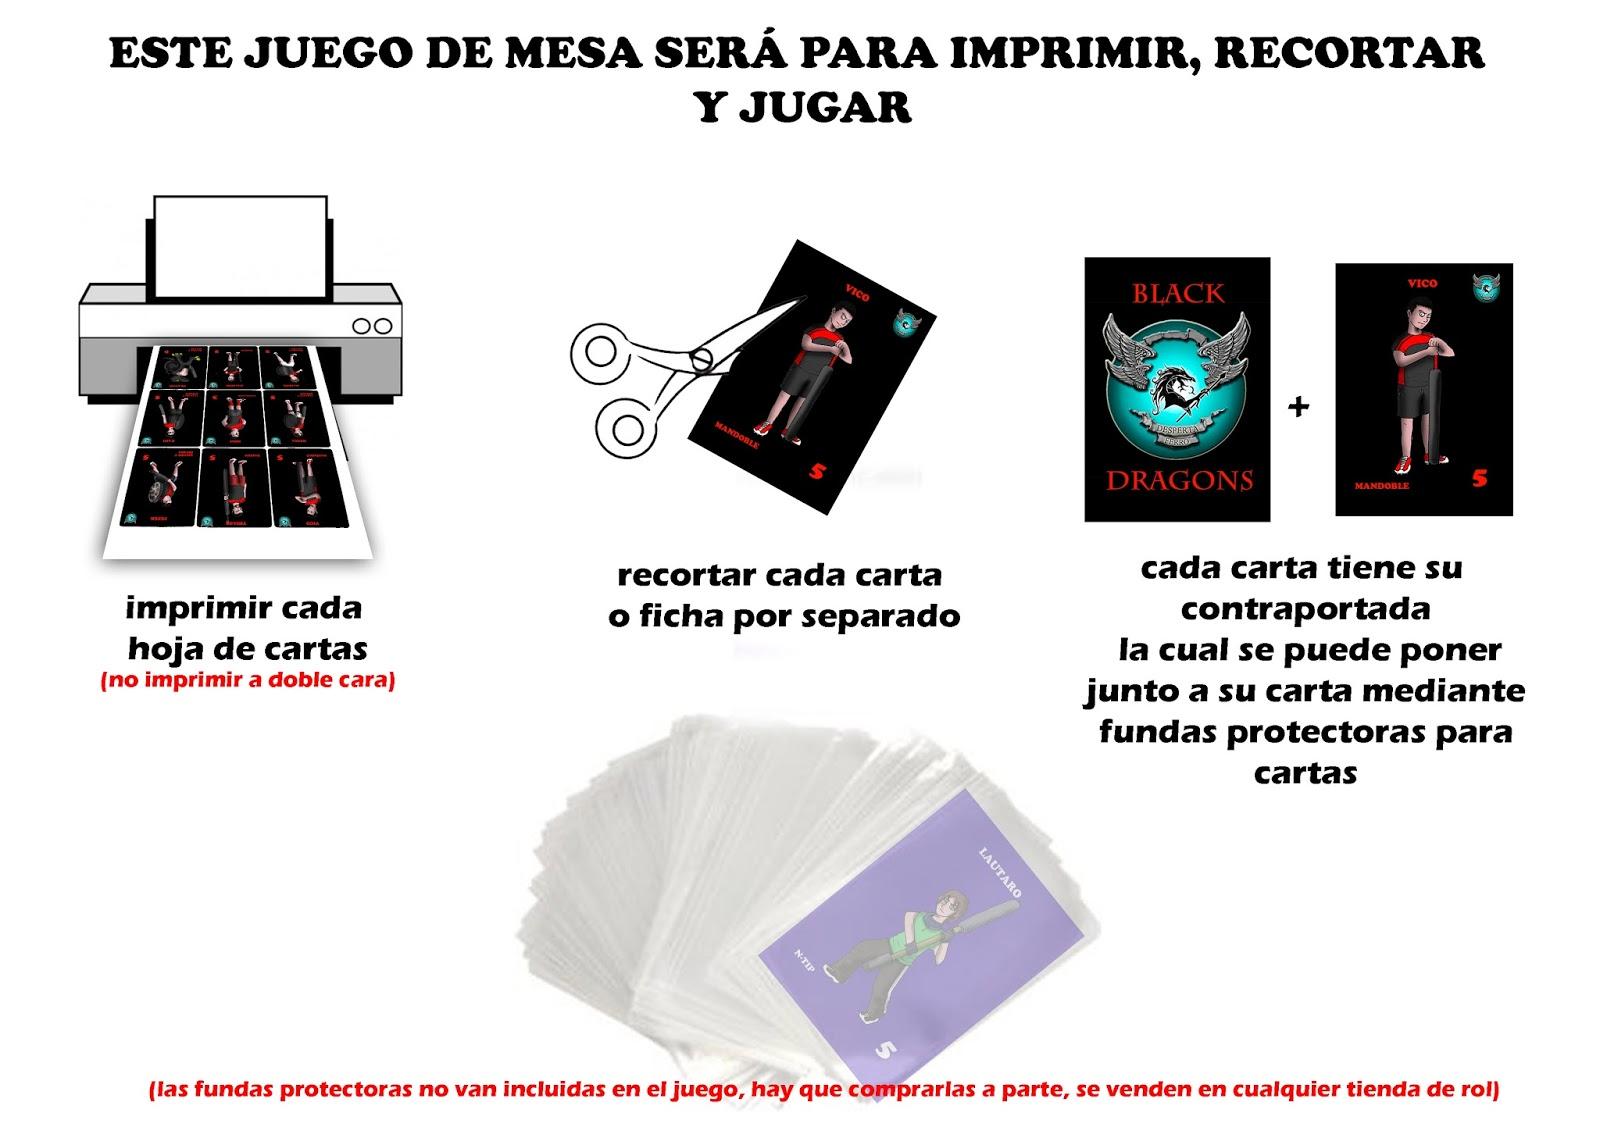 Luisocscomics Jugger Cards Juego De Mesa Para Imprimir Y Recortar